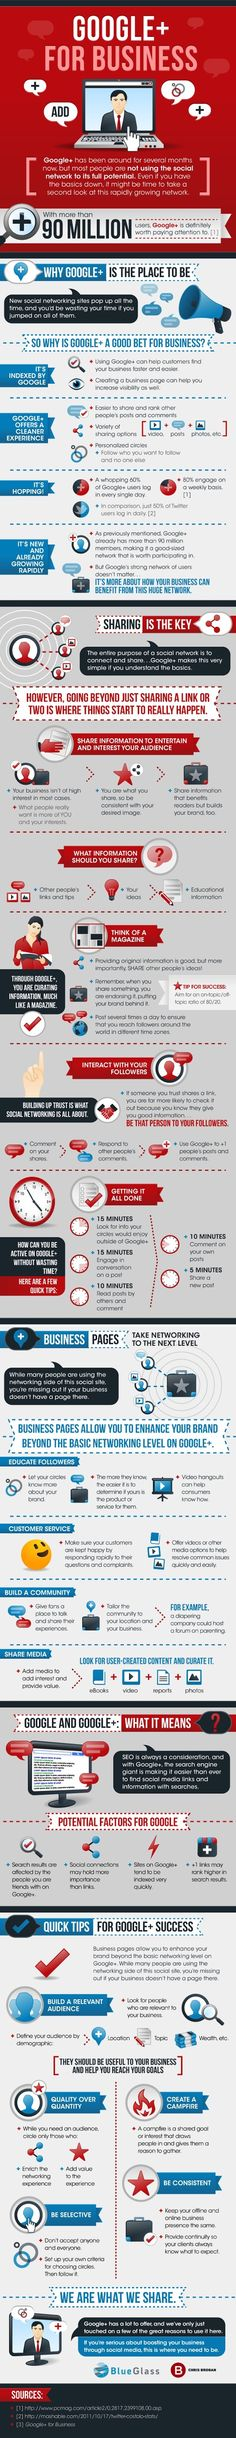 Google Plus for Business   Social Media Infographic www.socialmediamamma.com